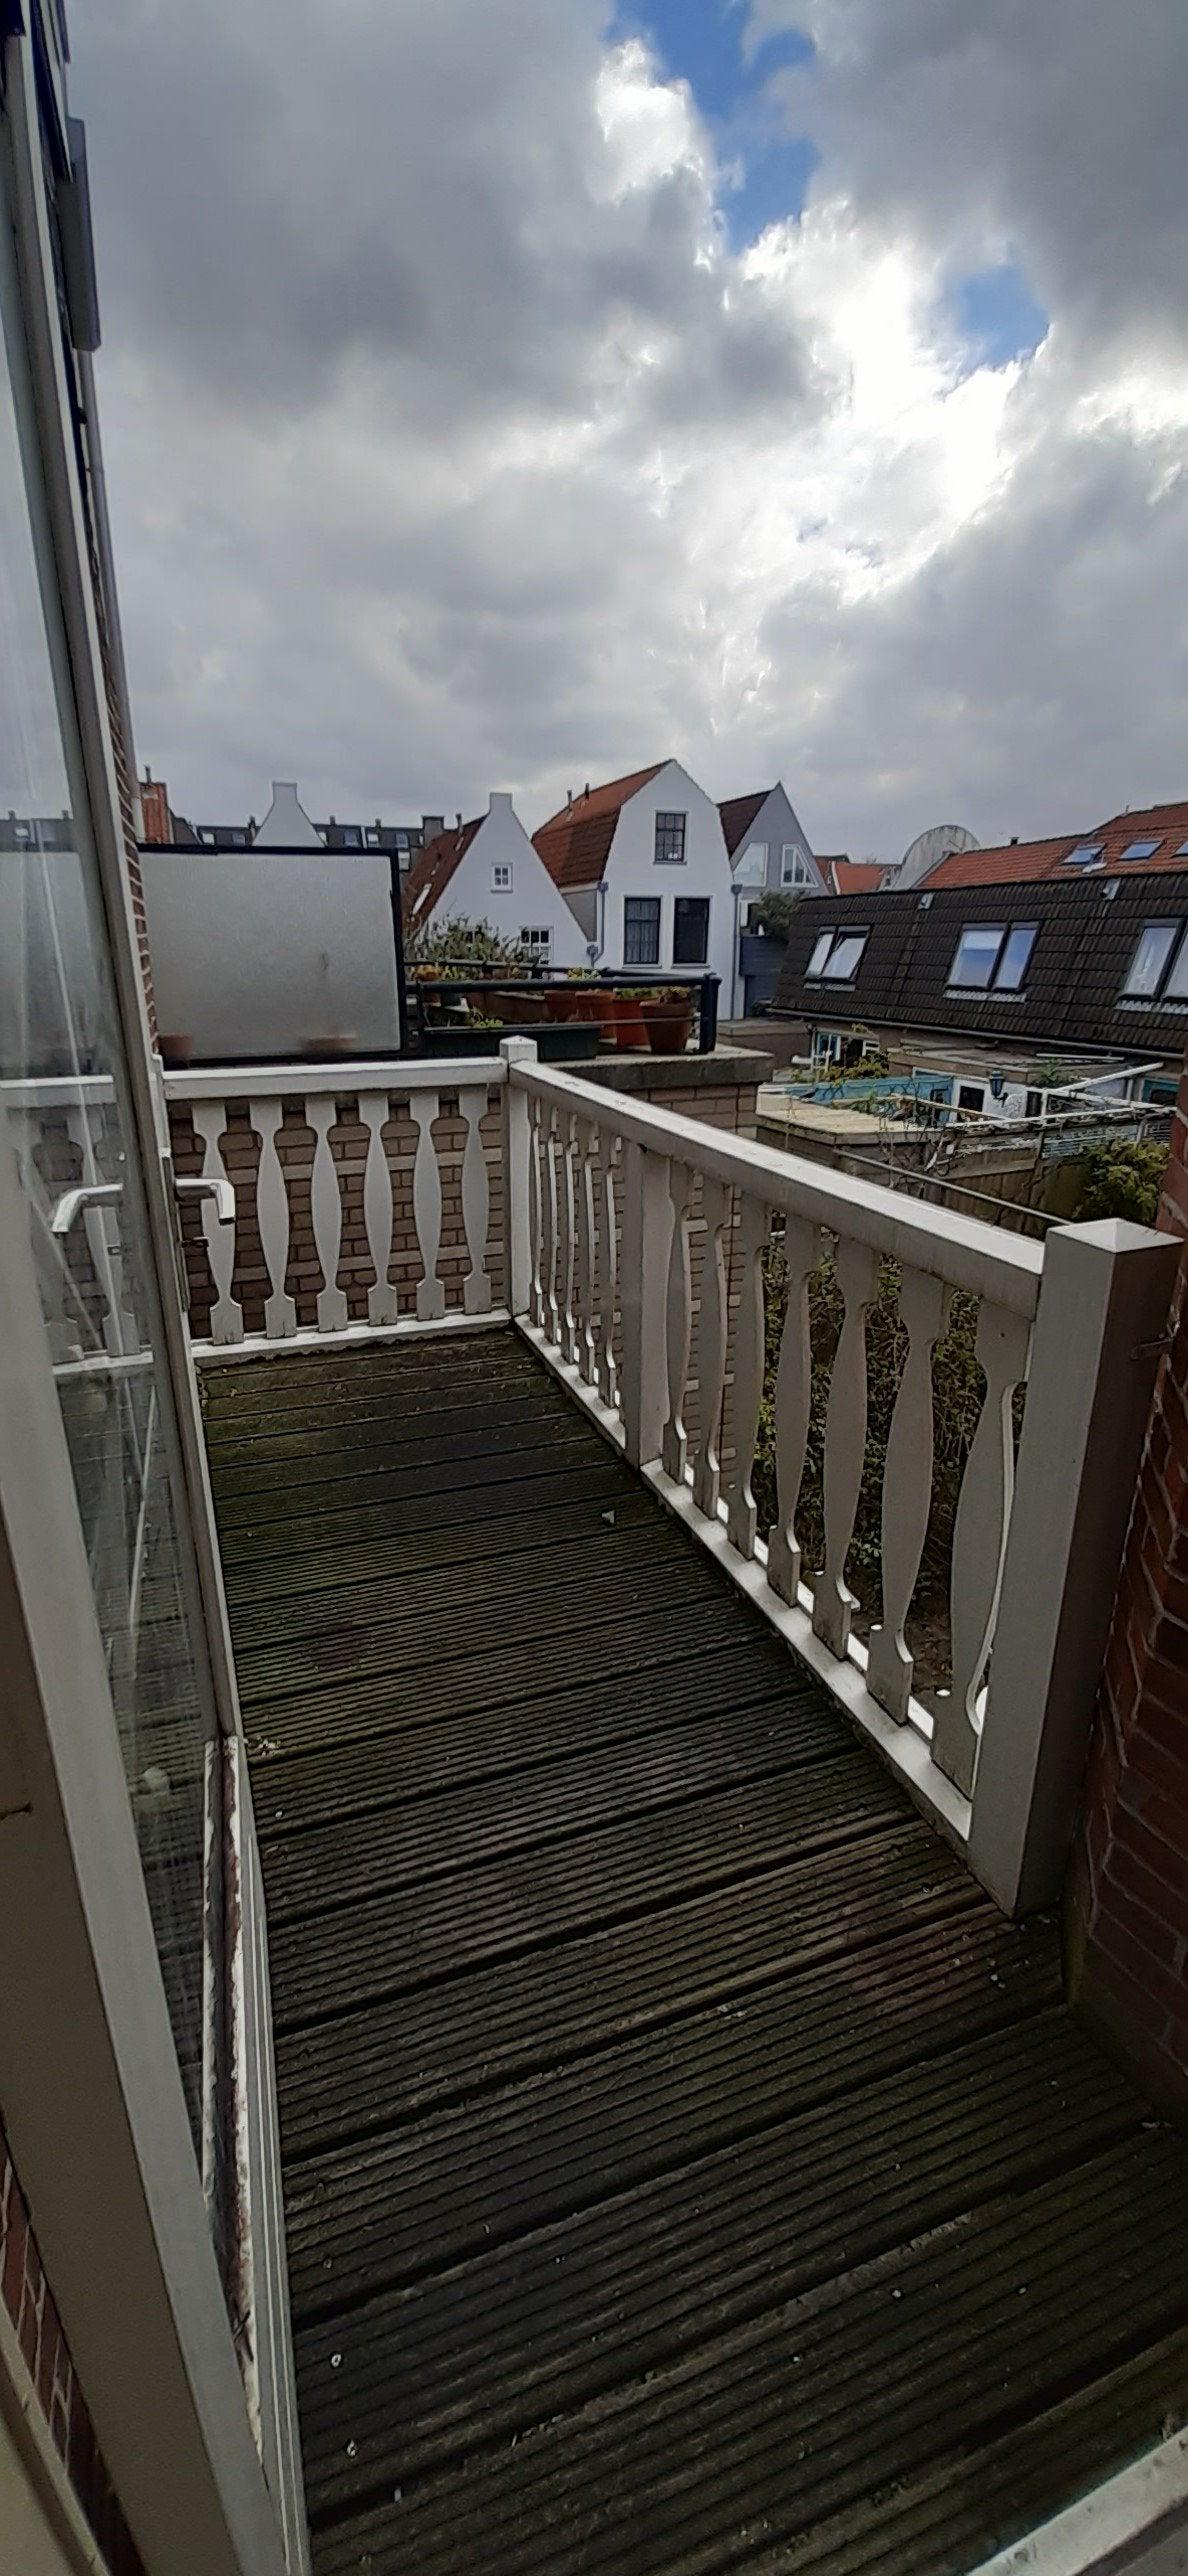 https://public.parariusoffice.nl/216/photos/huge/52404224.1585922652-195.jpg